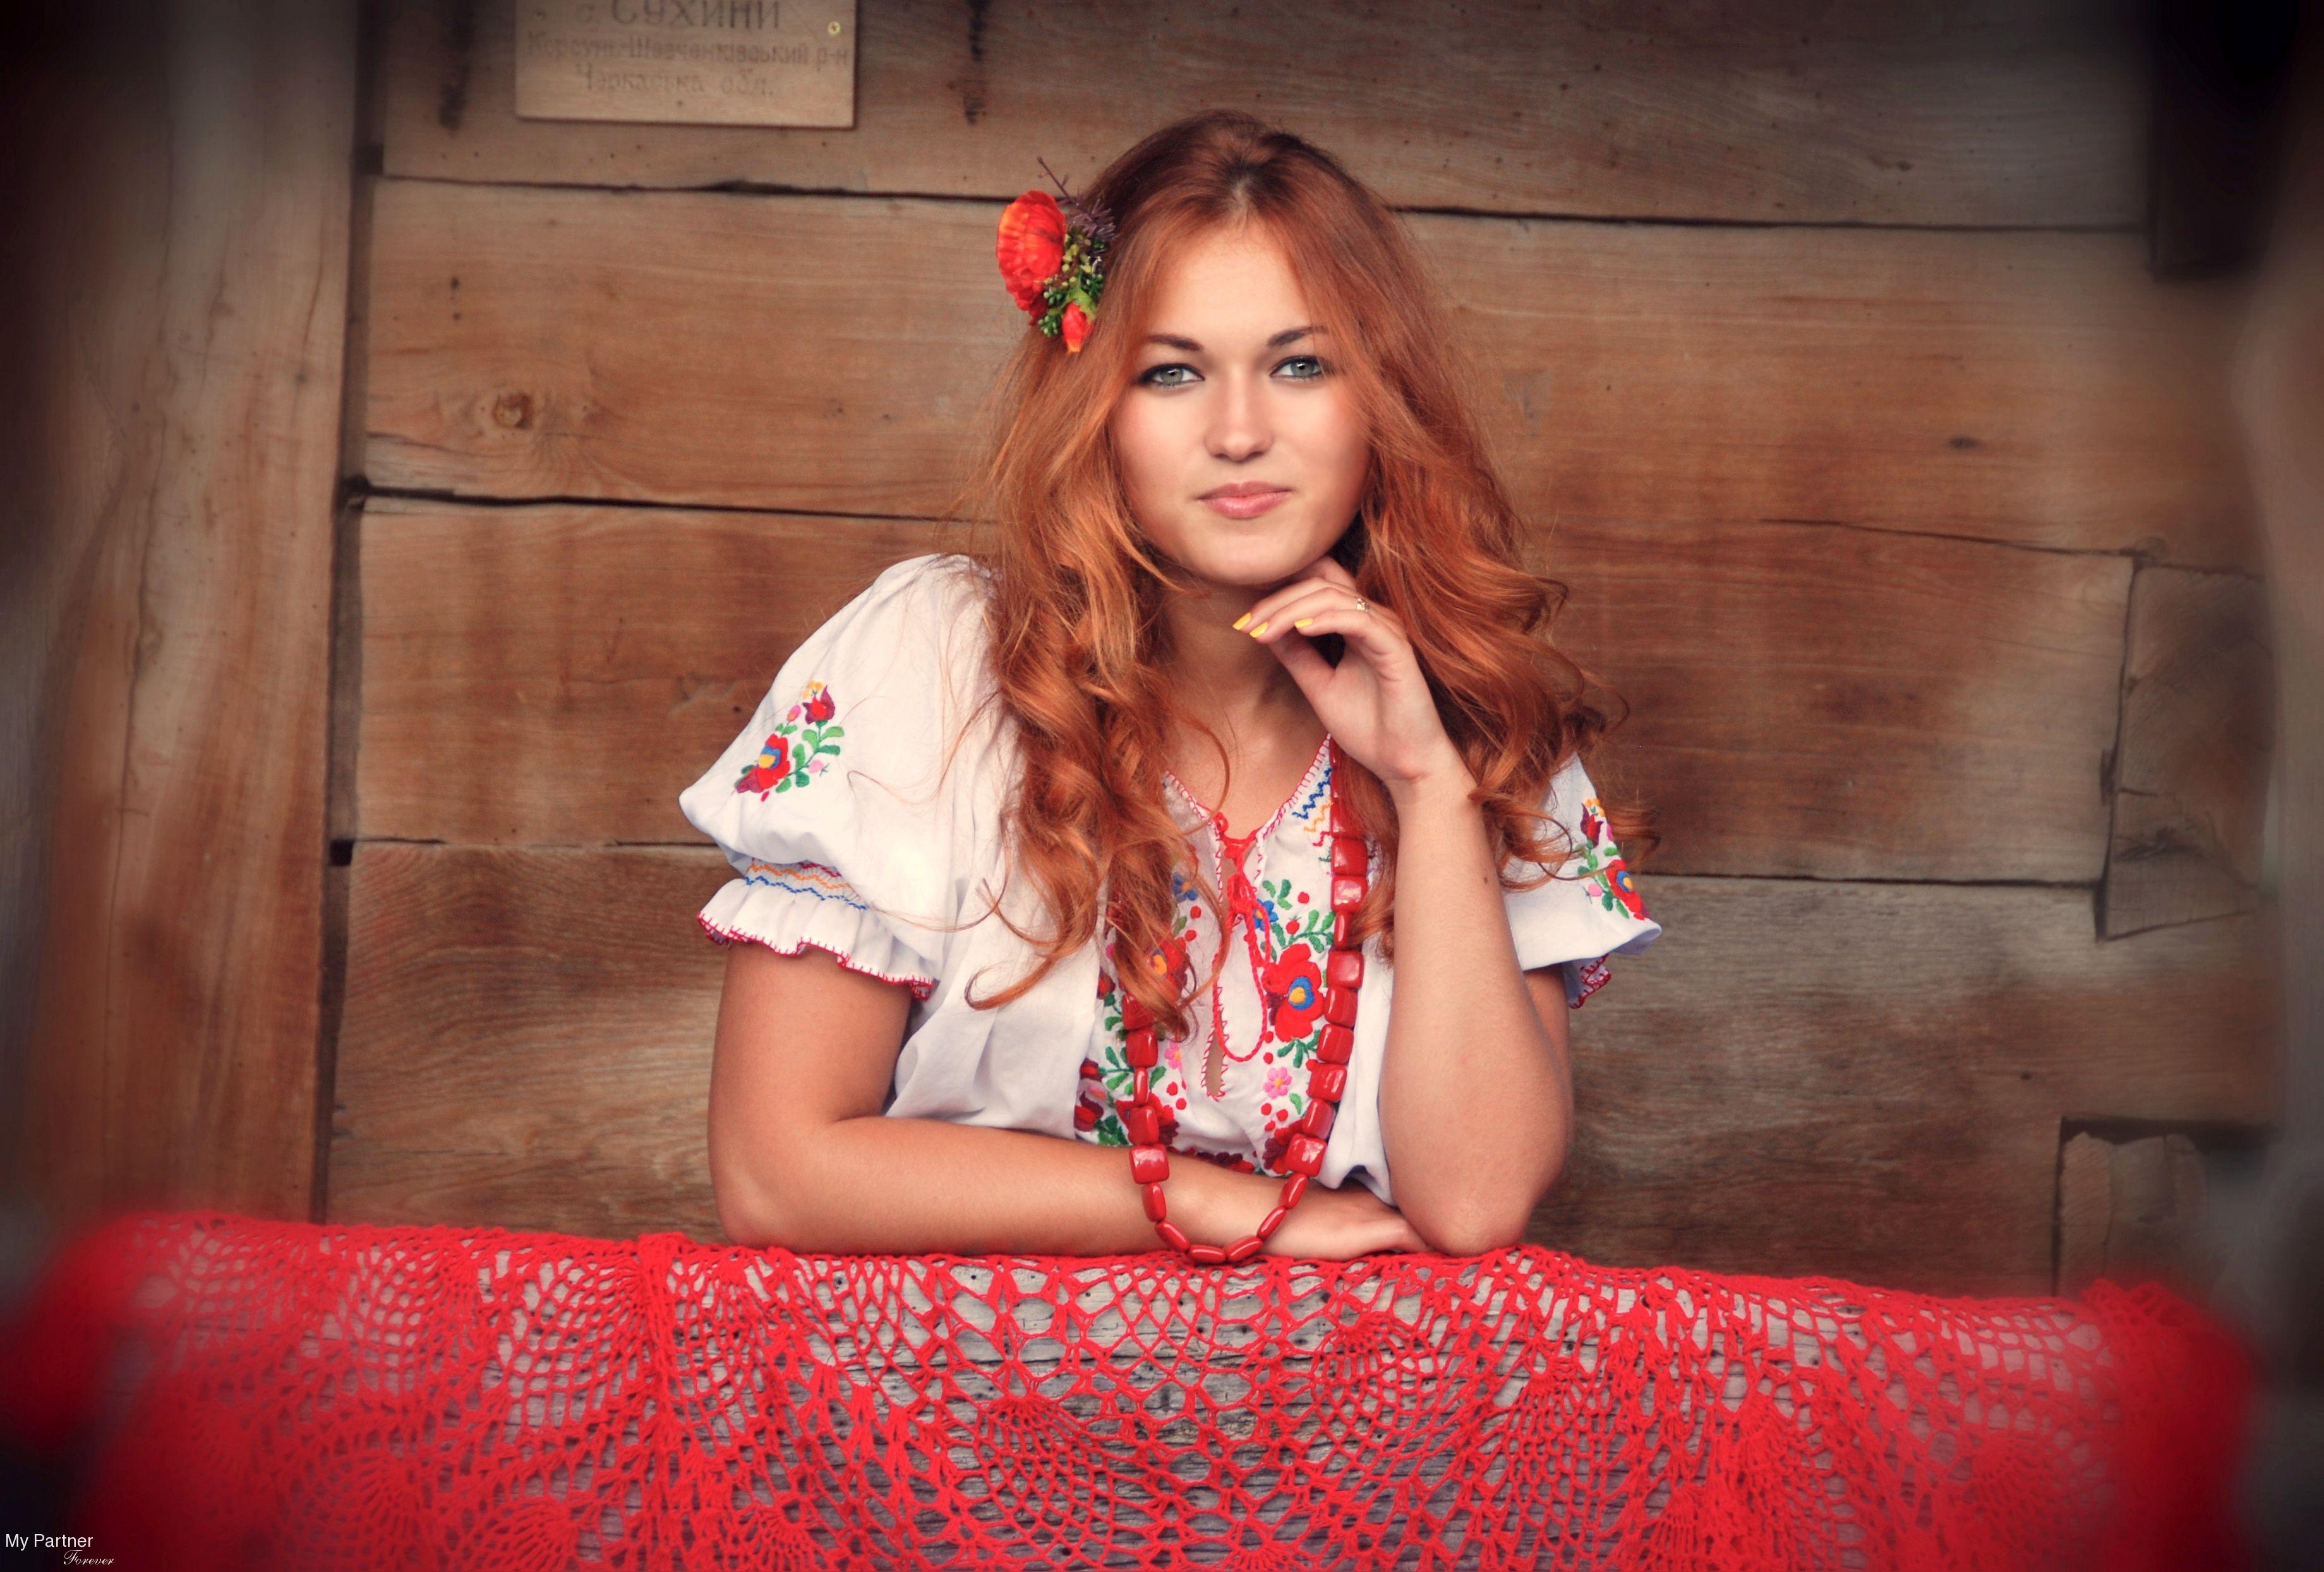 Kiev brides agency